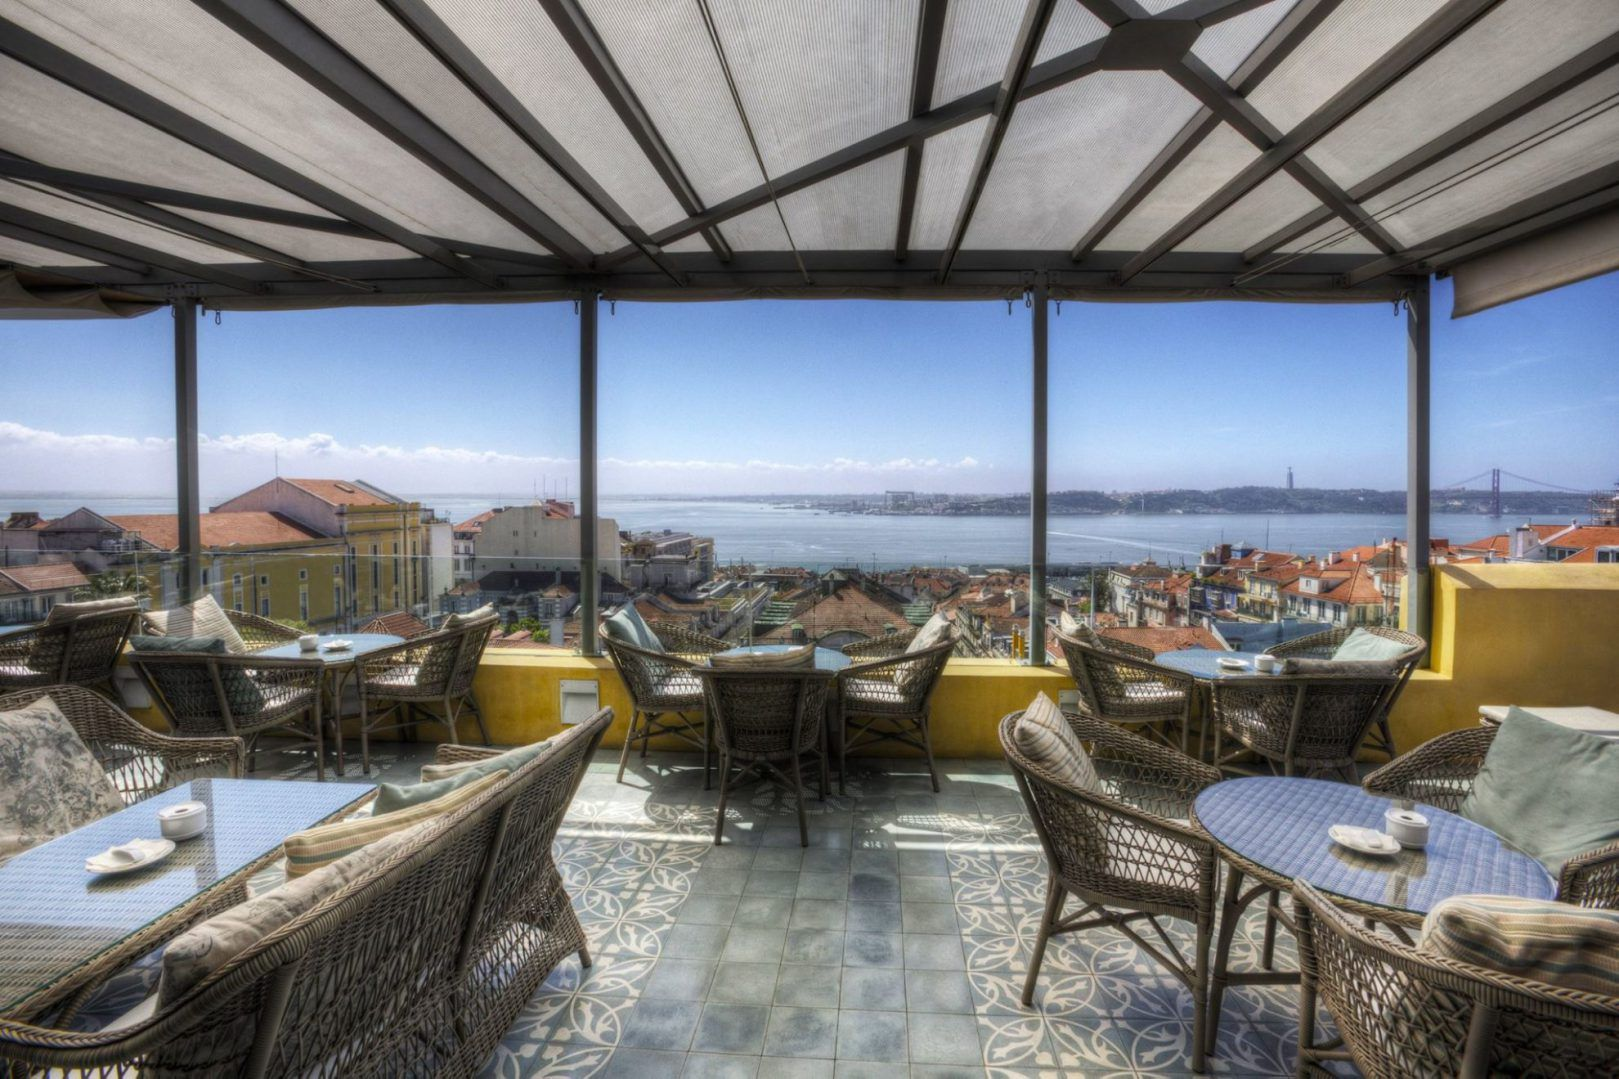 Terrace Ba Bar Terrasse Du Bairro Alto Hotel Lisbonne